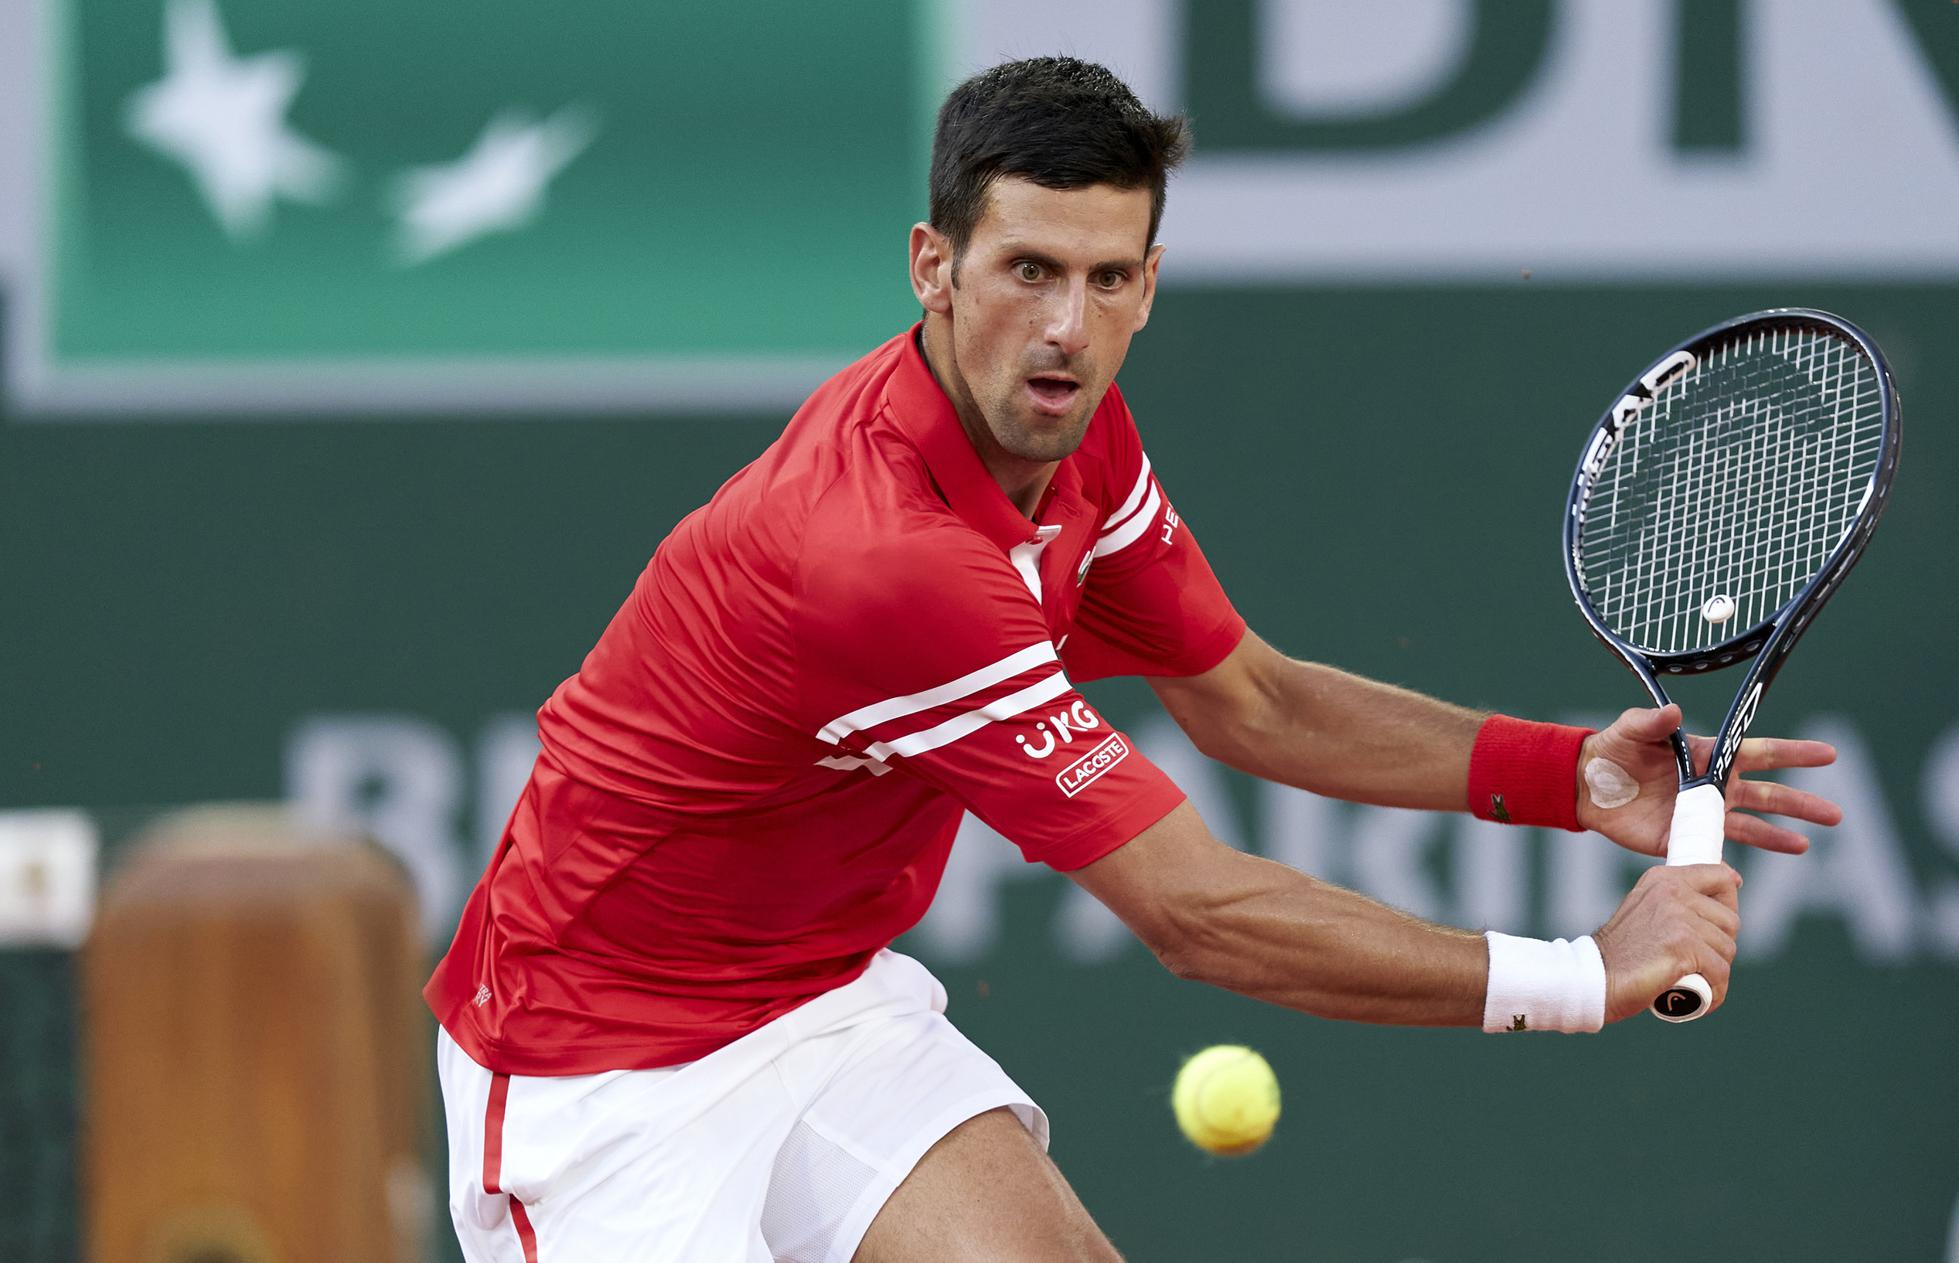 A New Tennis GOAT? How Novak Djokovic Stacks Up Against Nadal And Federer